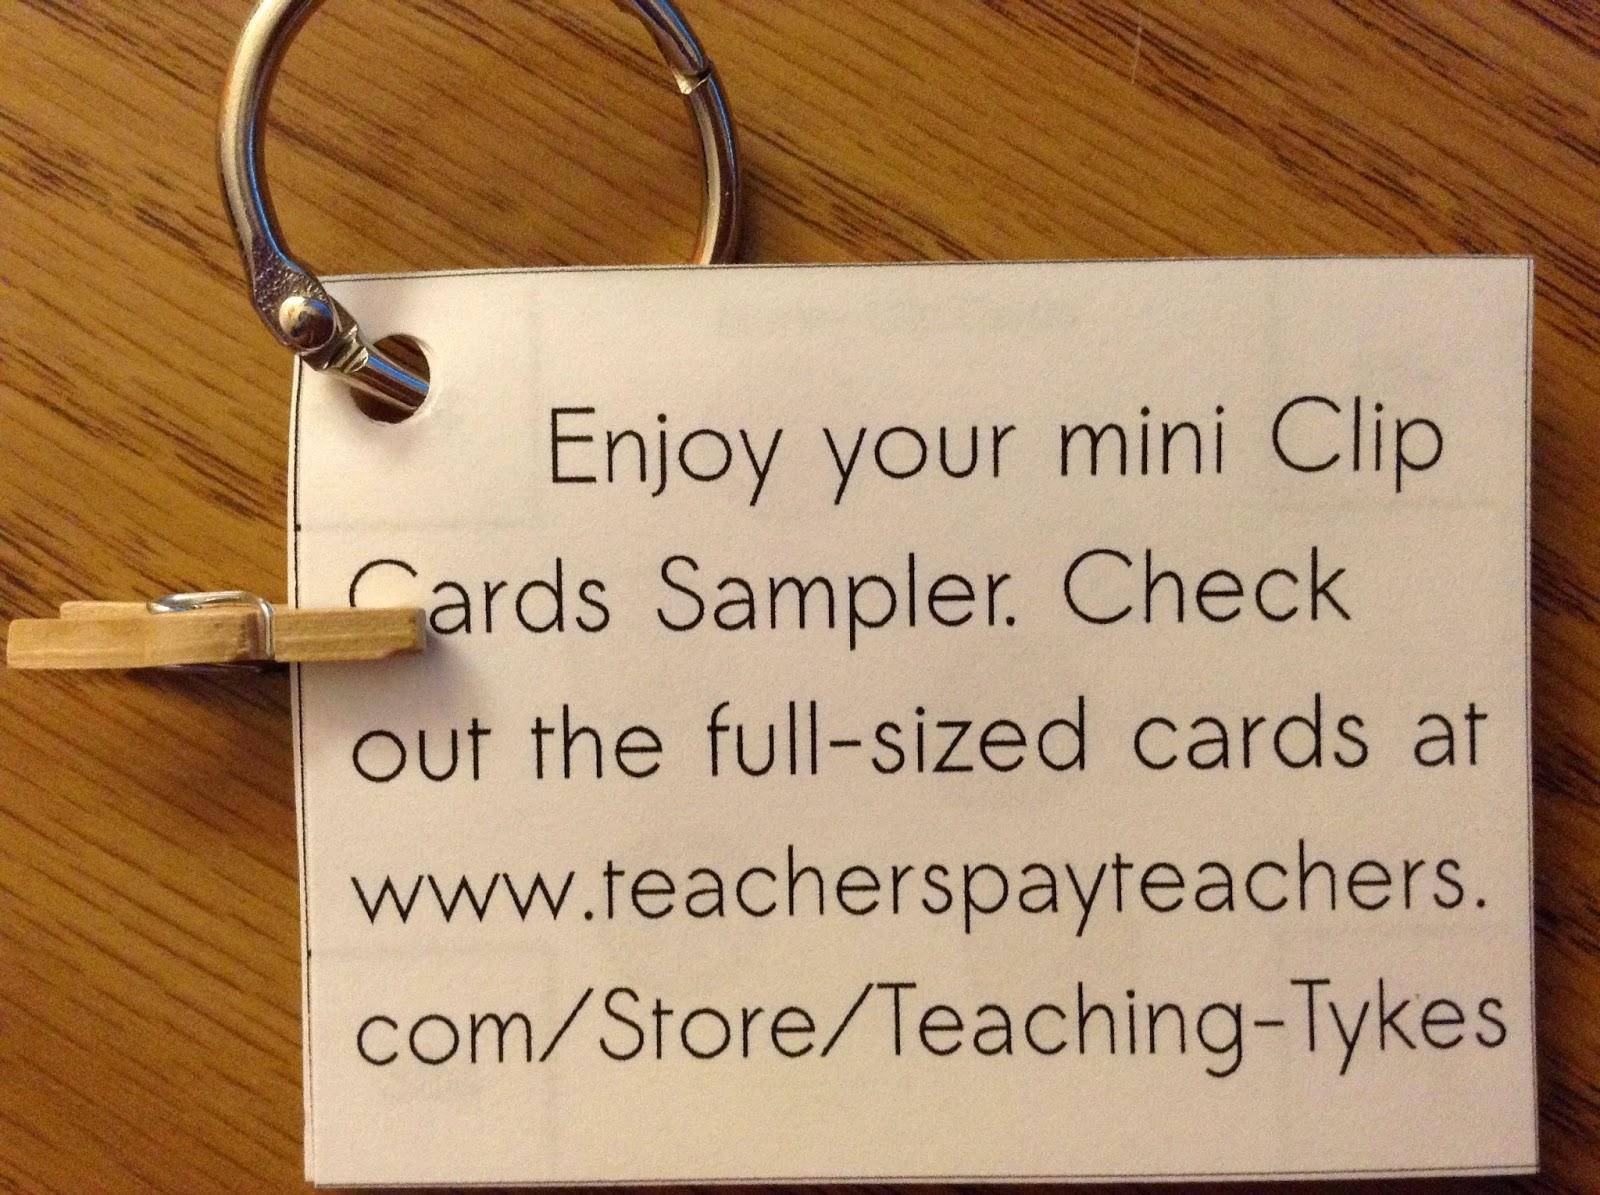 https://www.teacherspayteachers.com/Product/Interactive-Teaching-Tykes-Catalog-1684567